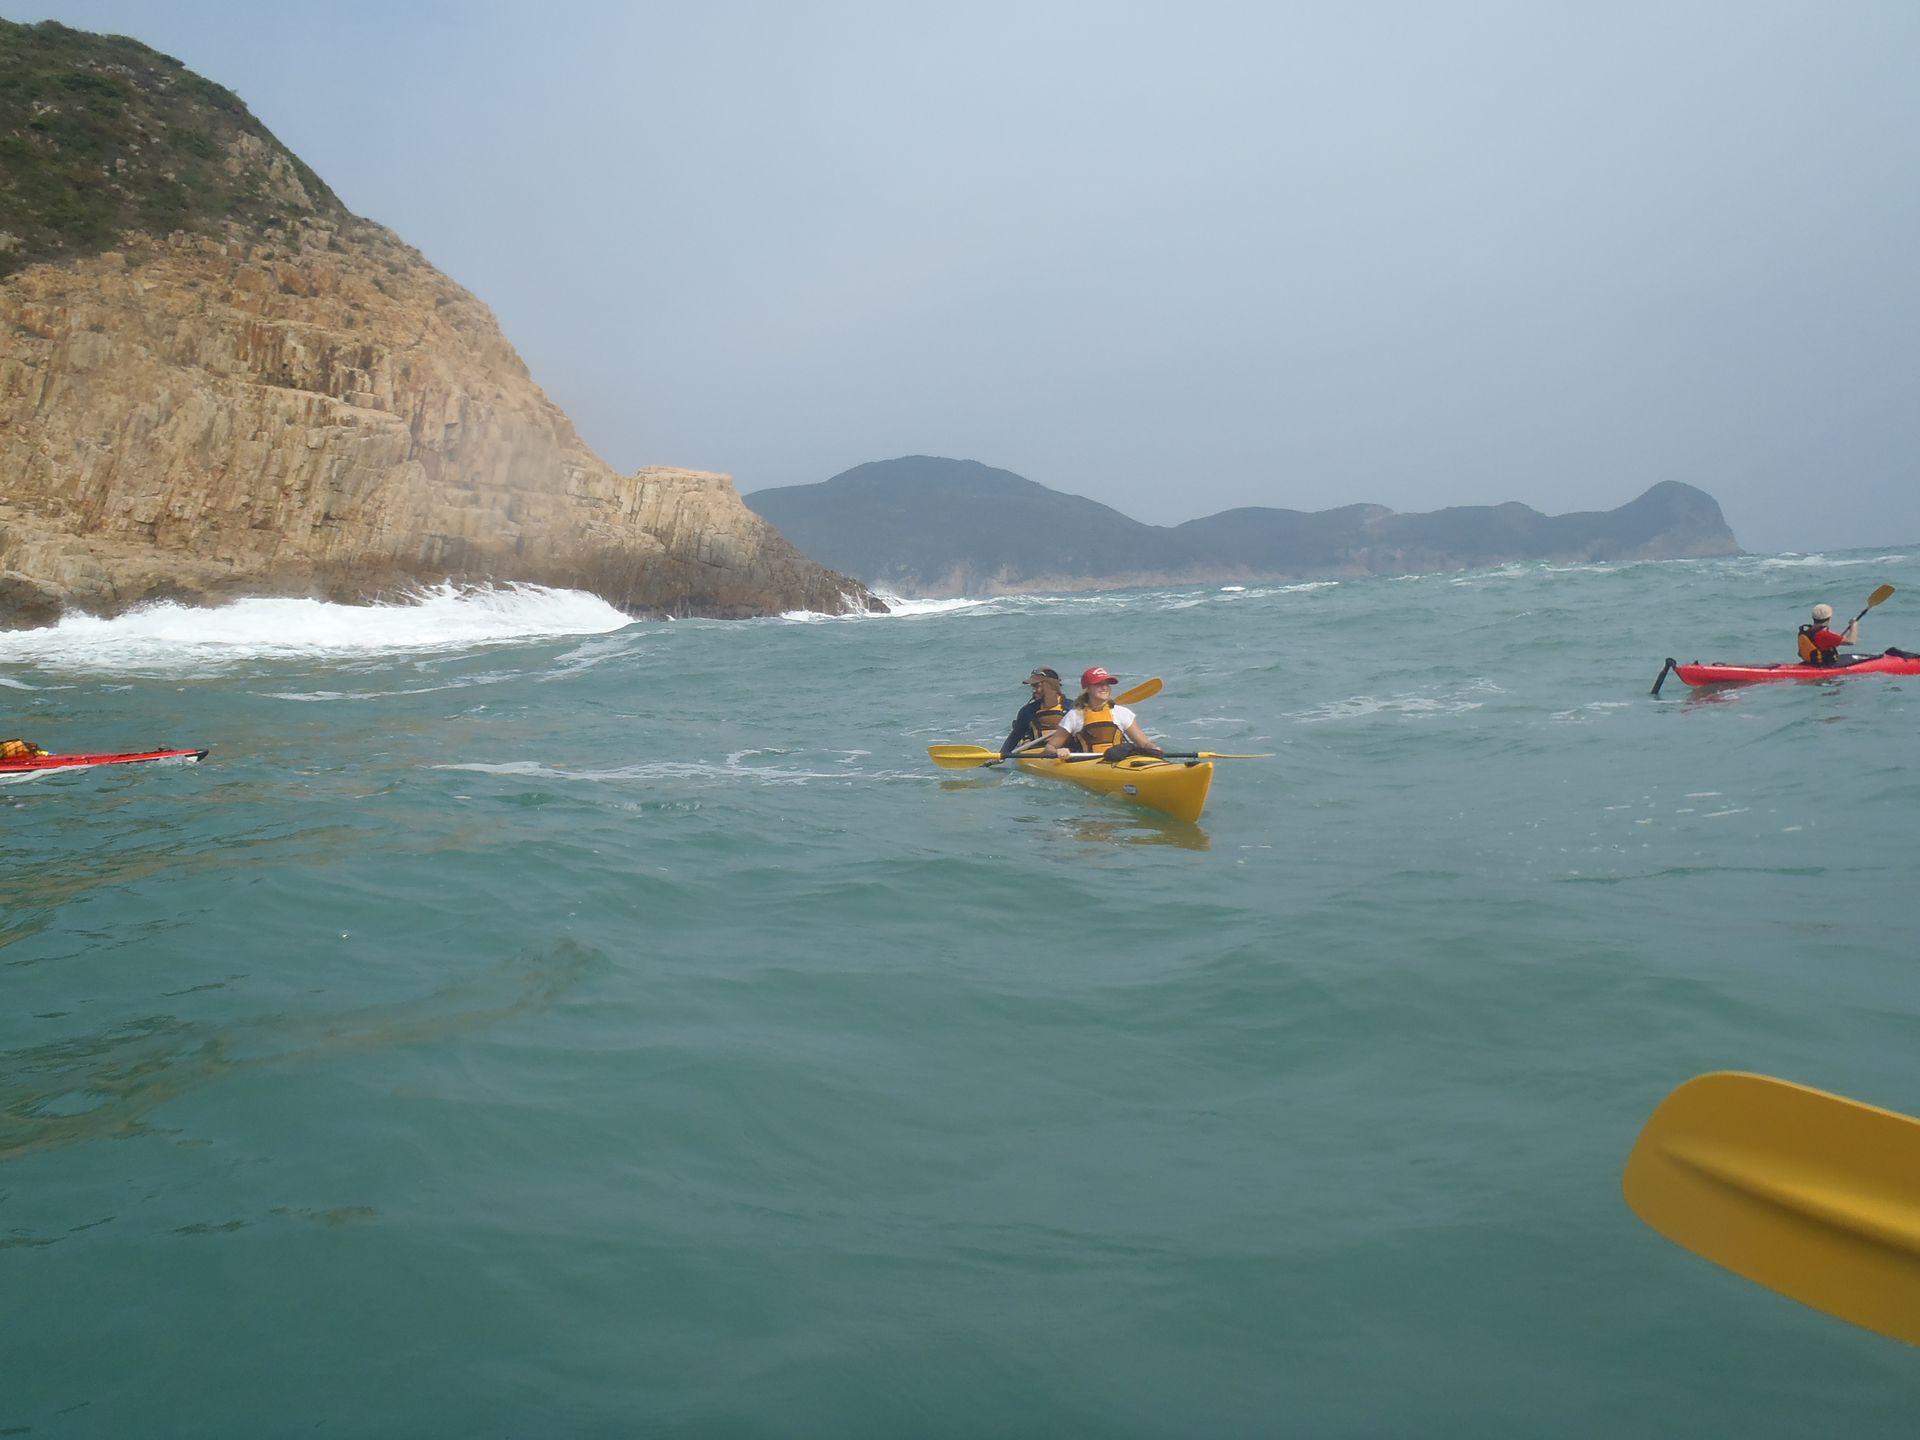 Sea kayak global geopark2